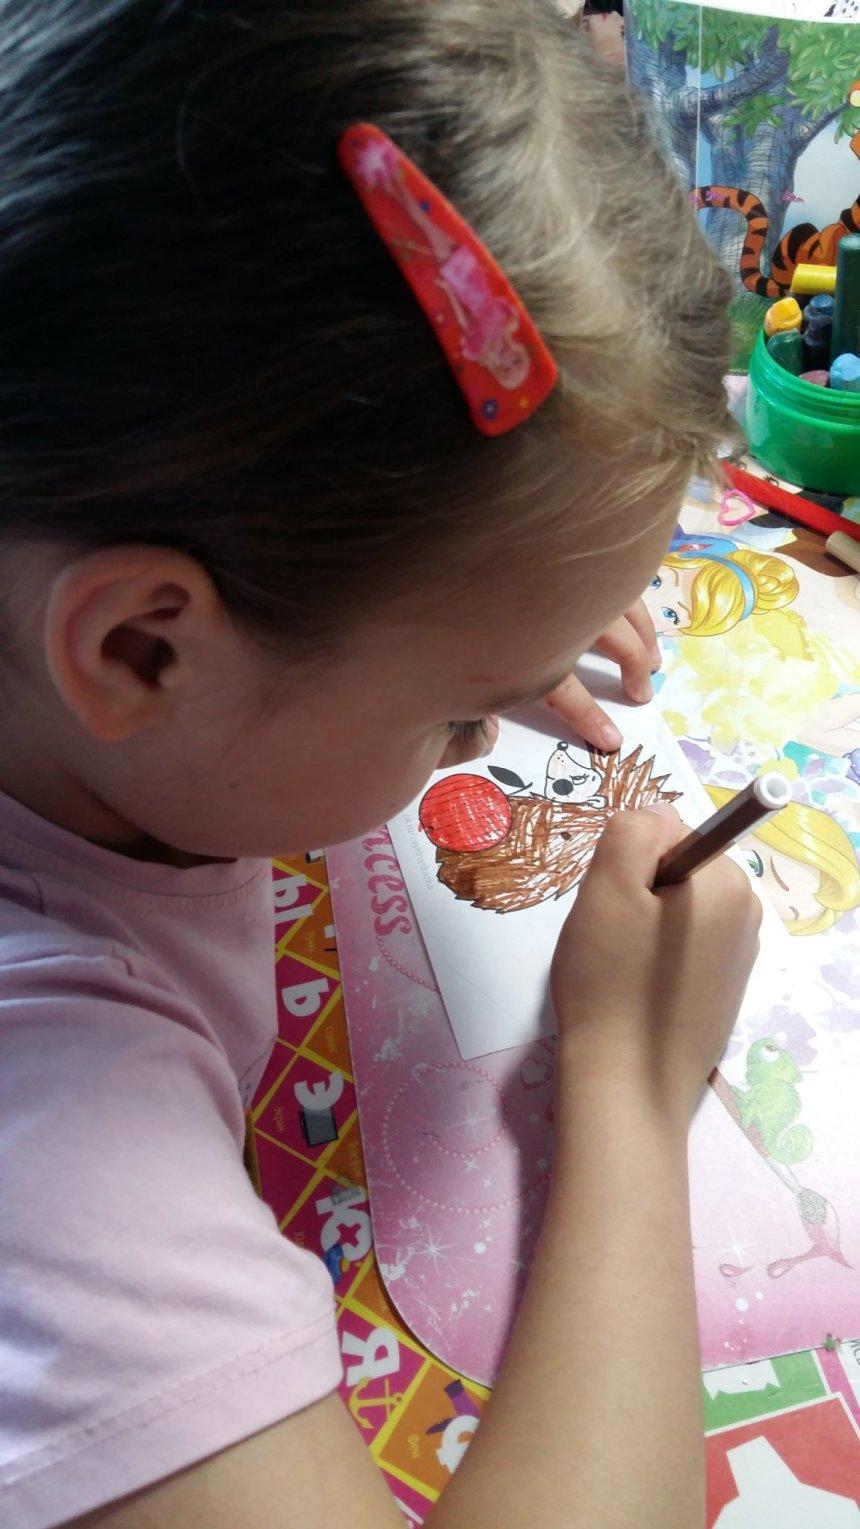 Отчёт по занятию Разукрашивание картинок методом штриховки в Wachanga!